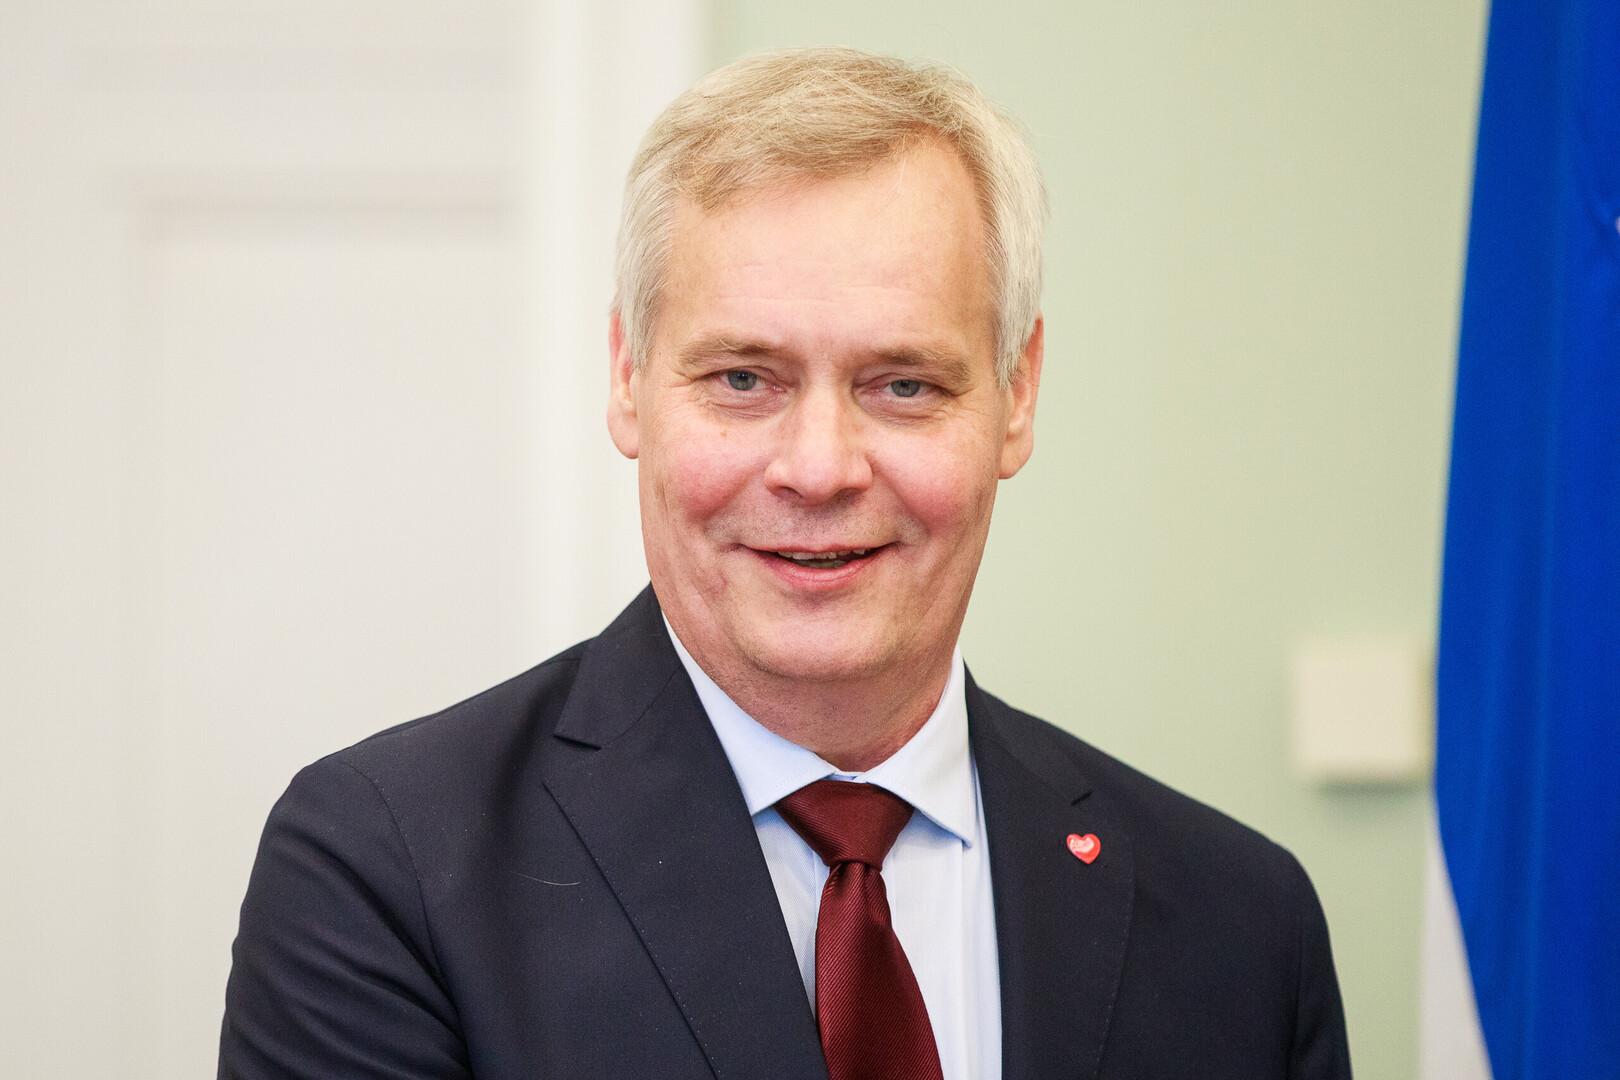 Image result for Finnish Prime Minister Antti Rinne